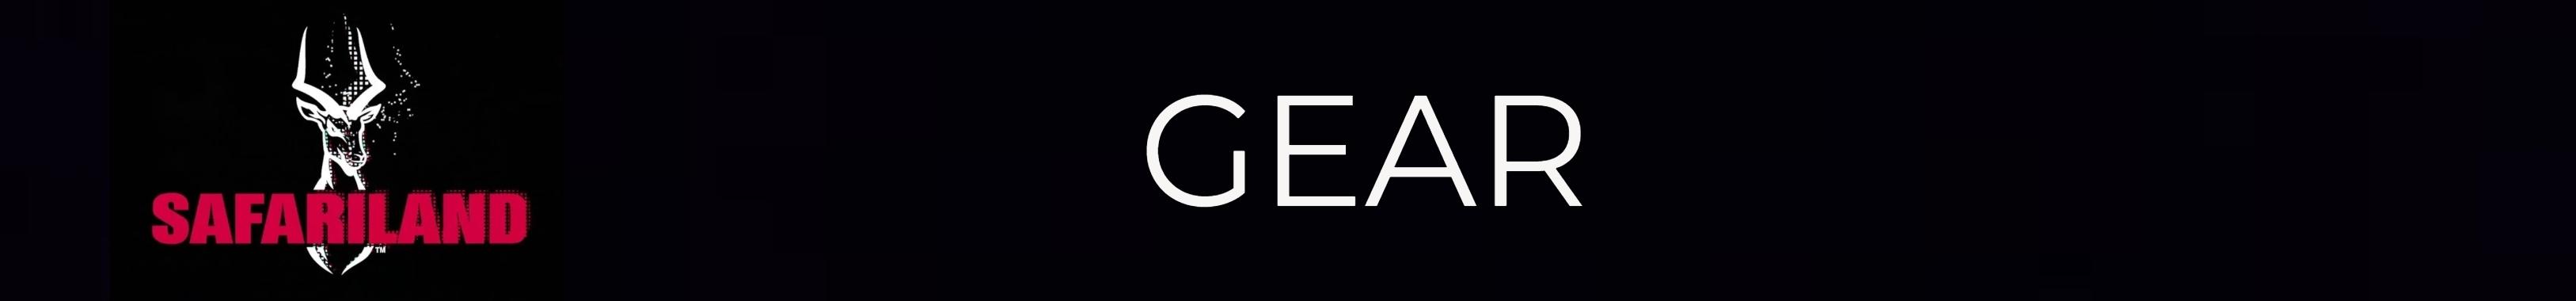 GEAR21.jpg